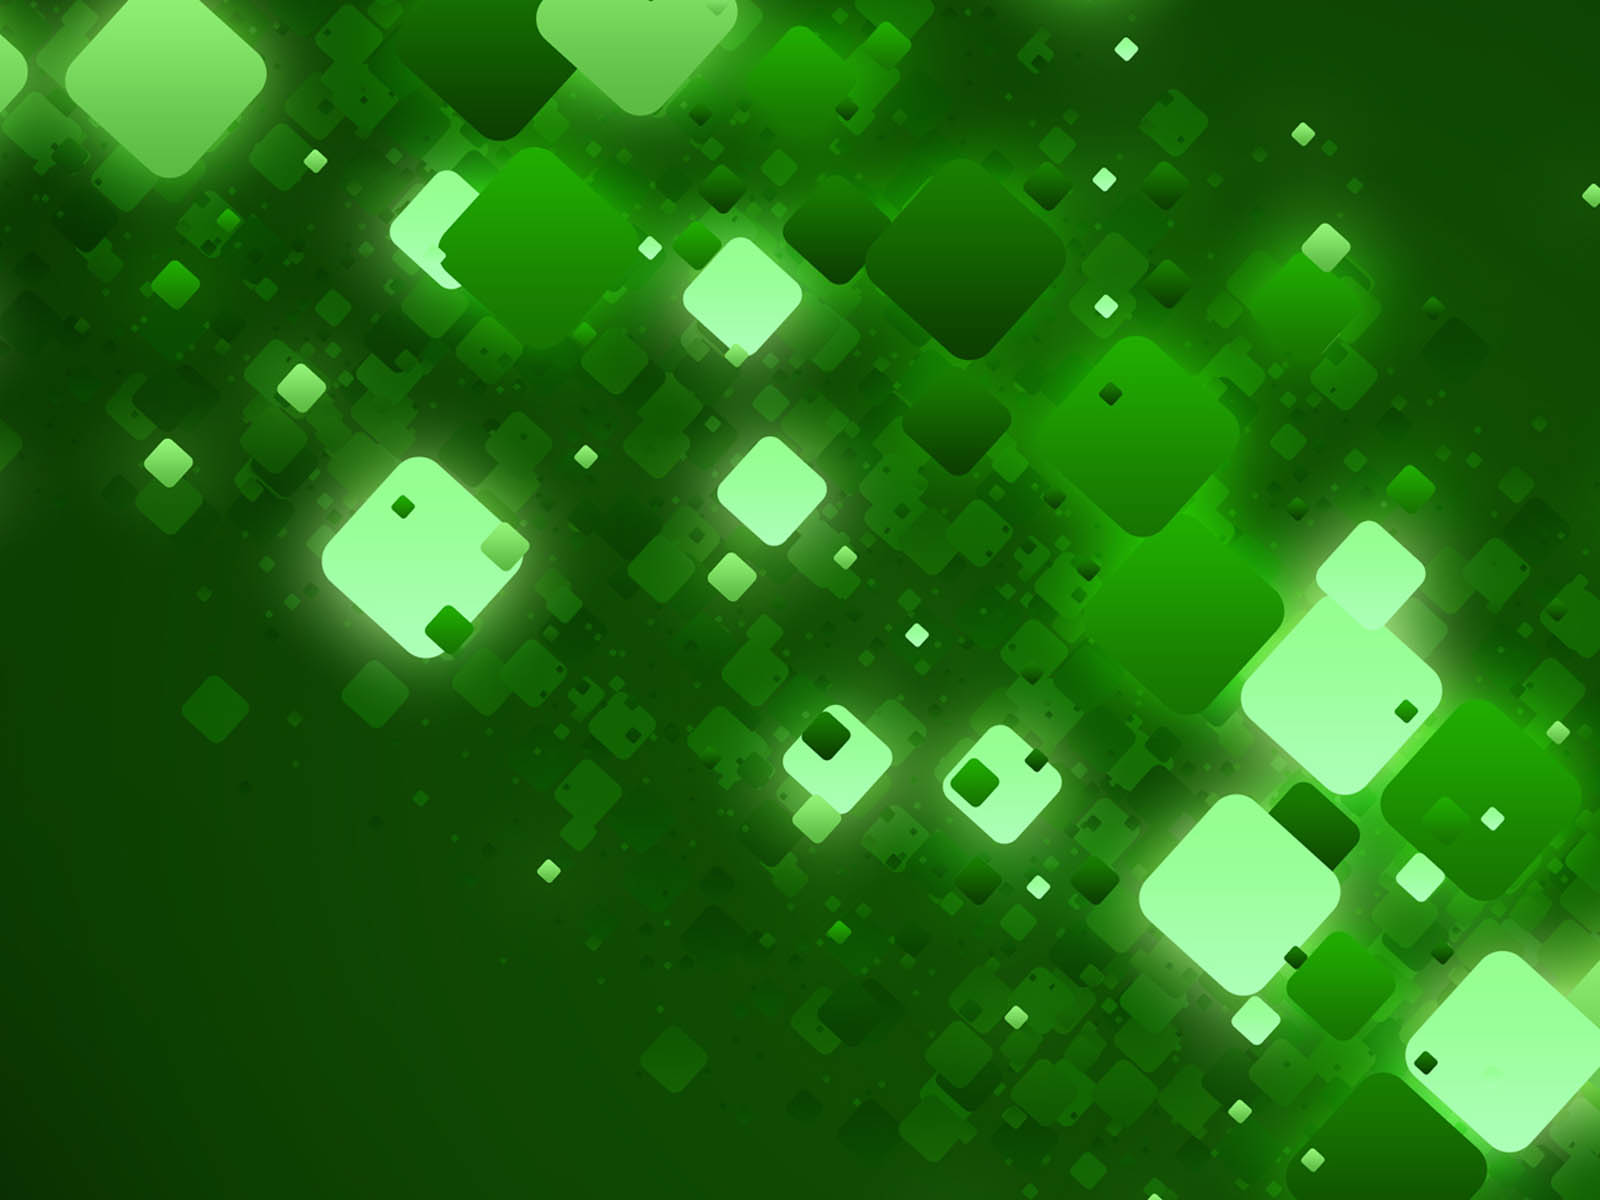 green high resolution abstract wallpaper - photo #8